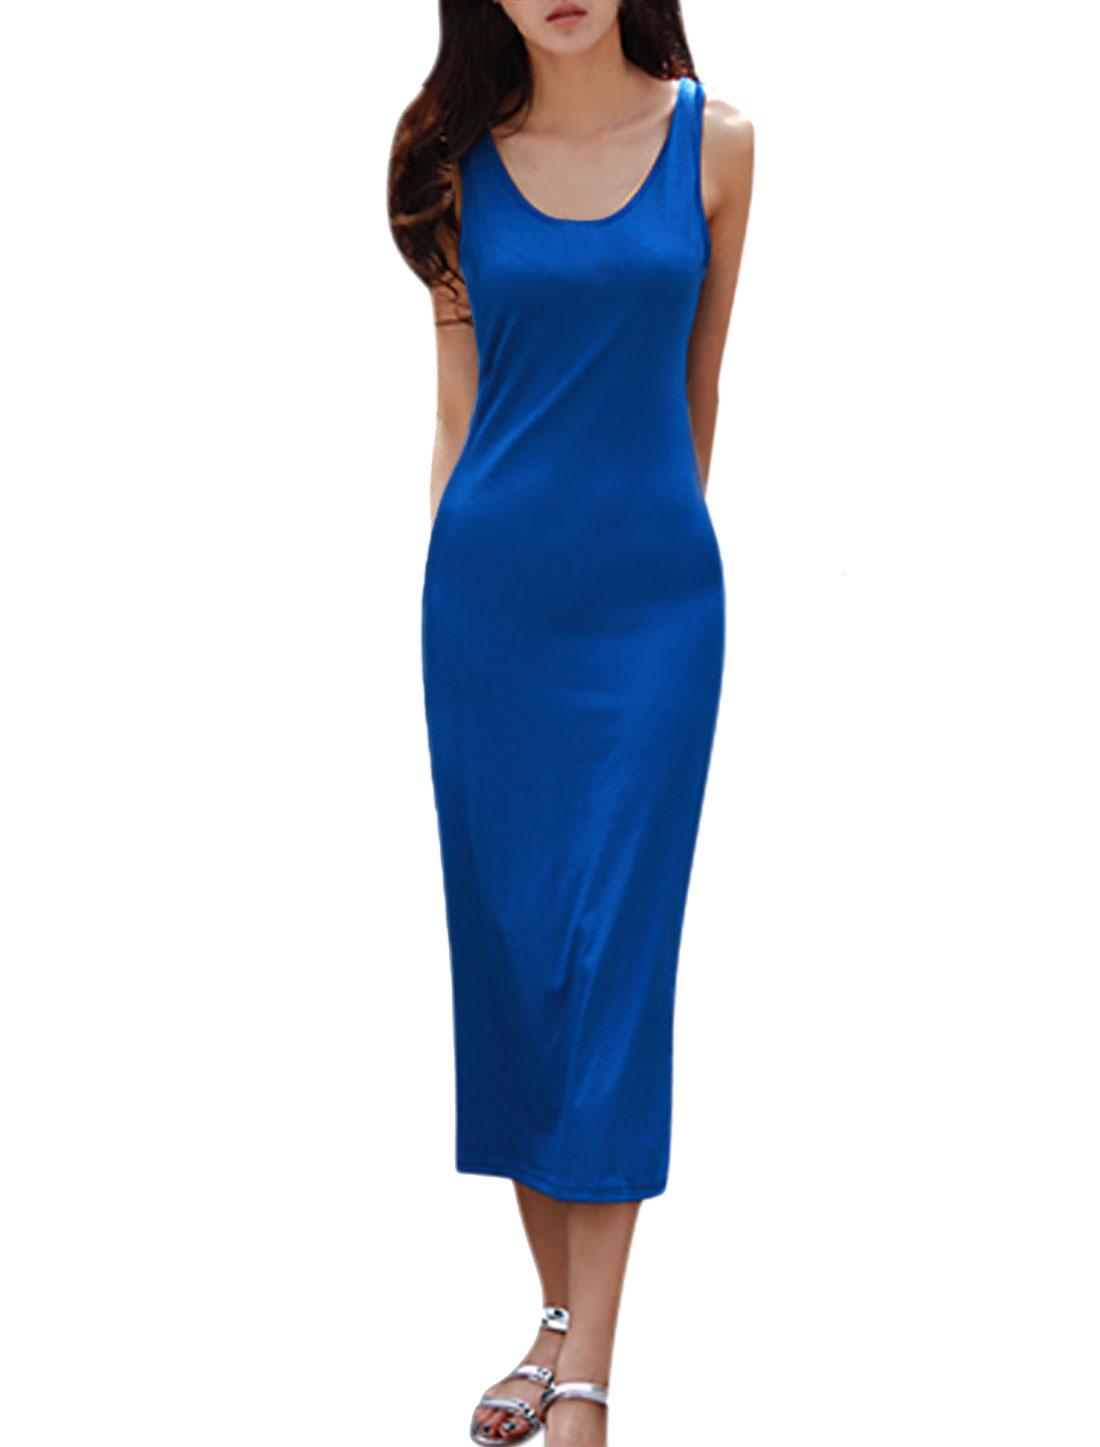 Ladies Sleeveless Scoop Neck Unlined Slim Fit Long Dress Royal Blue M